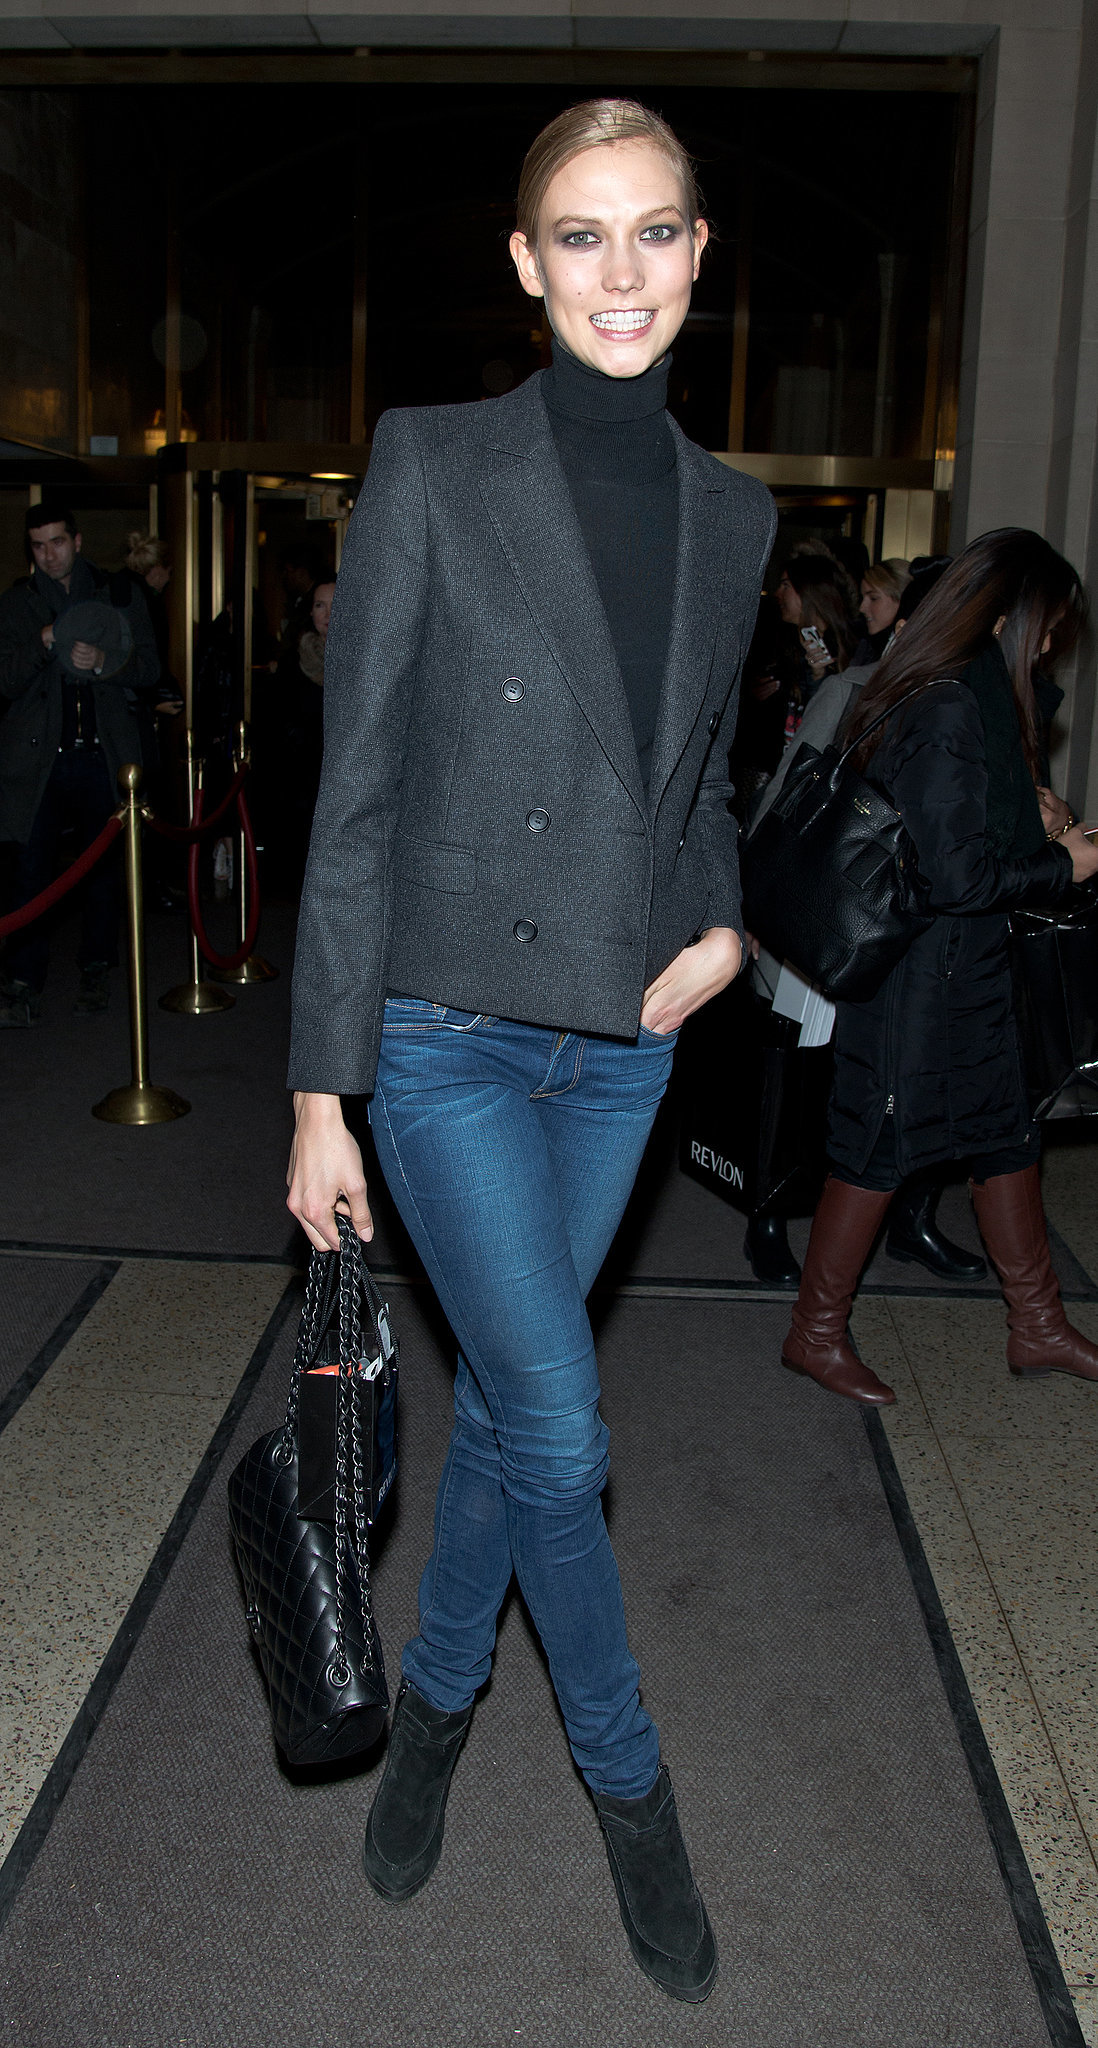 Karlie Kloss in a Turtleneck and Blazer